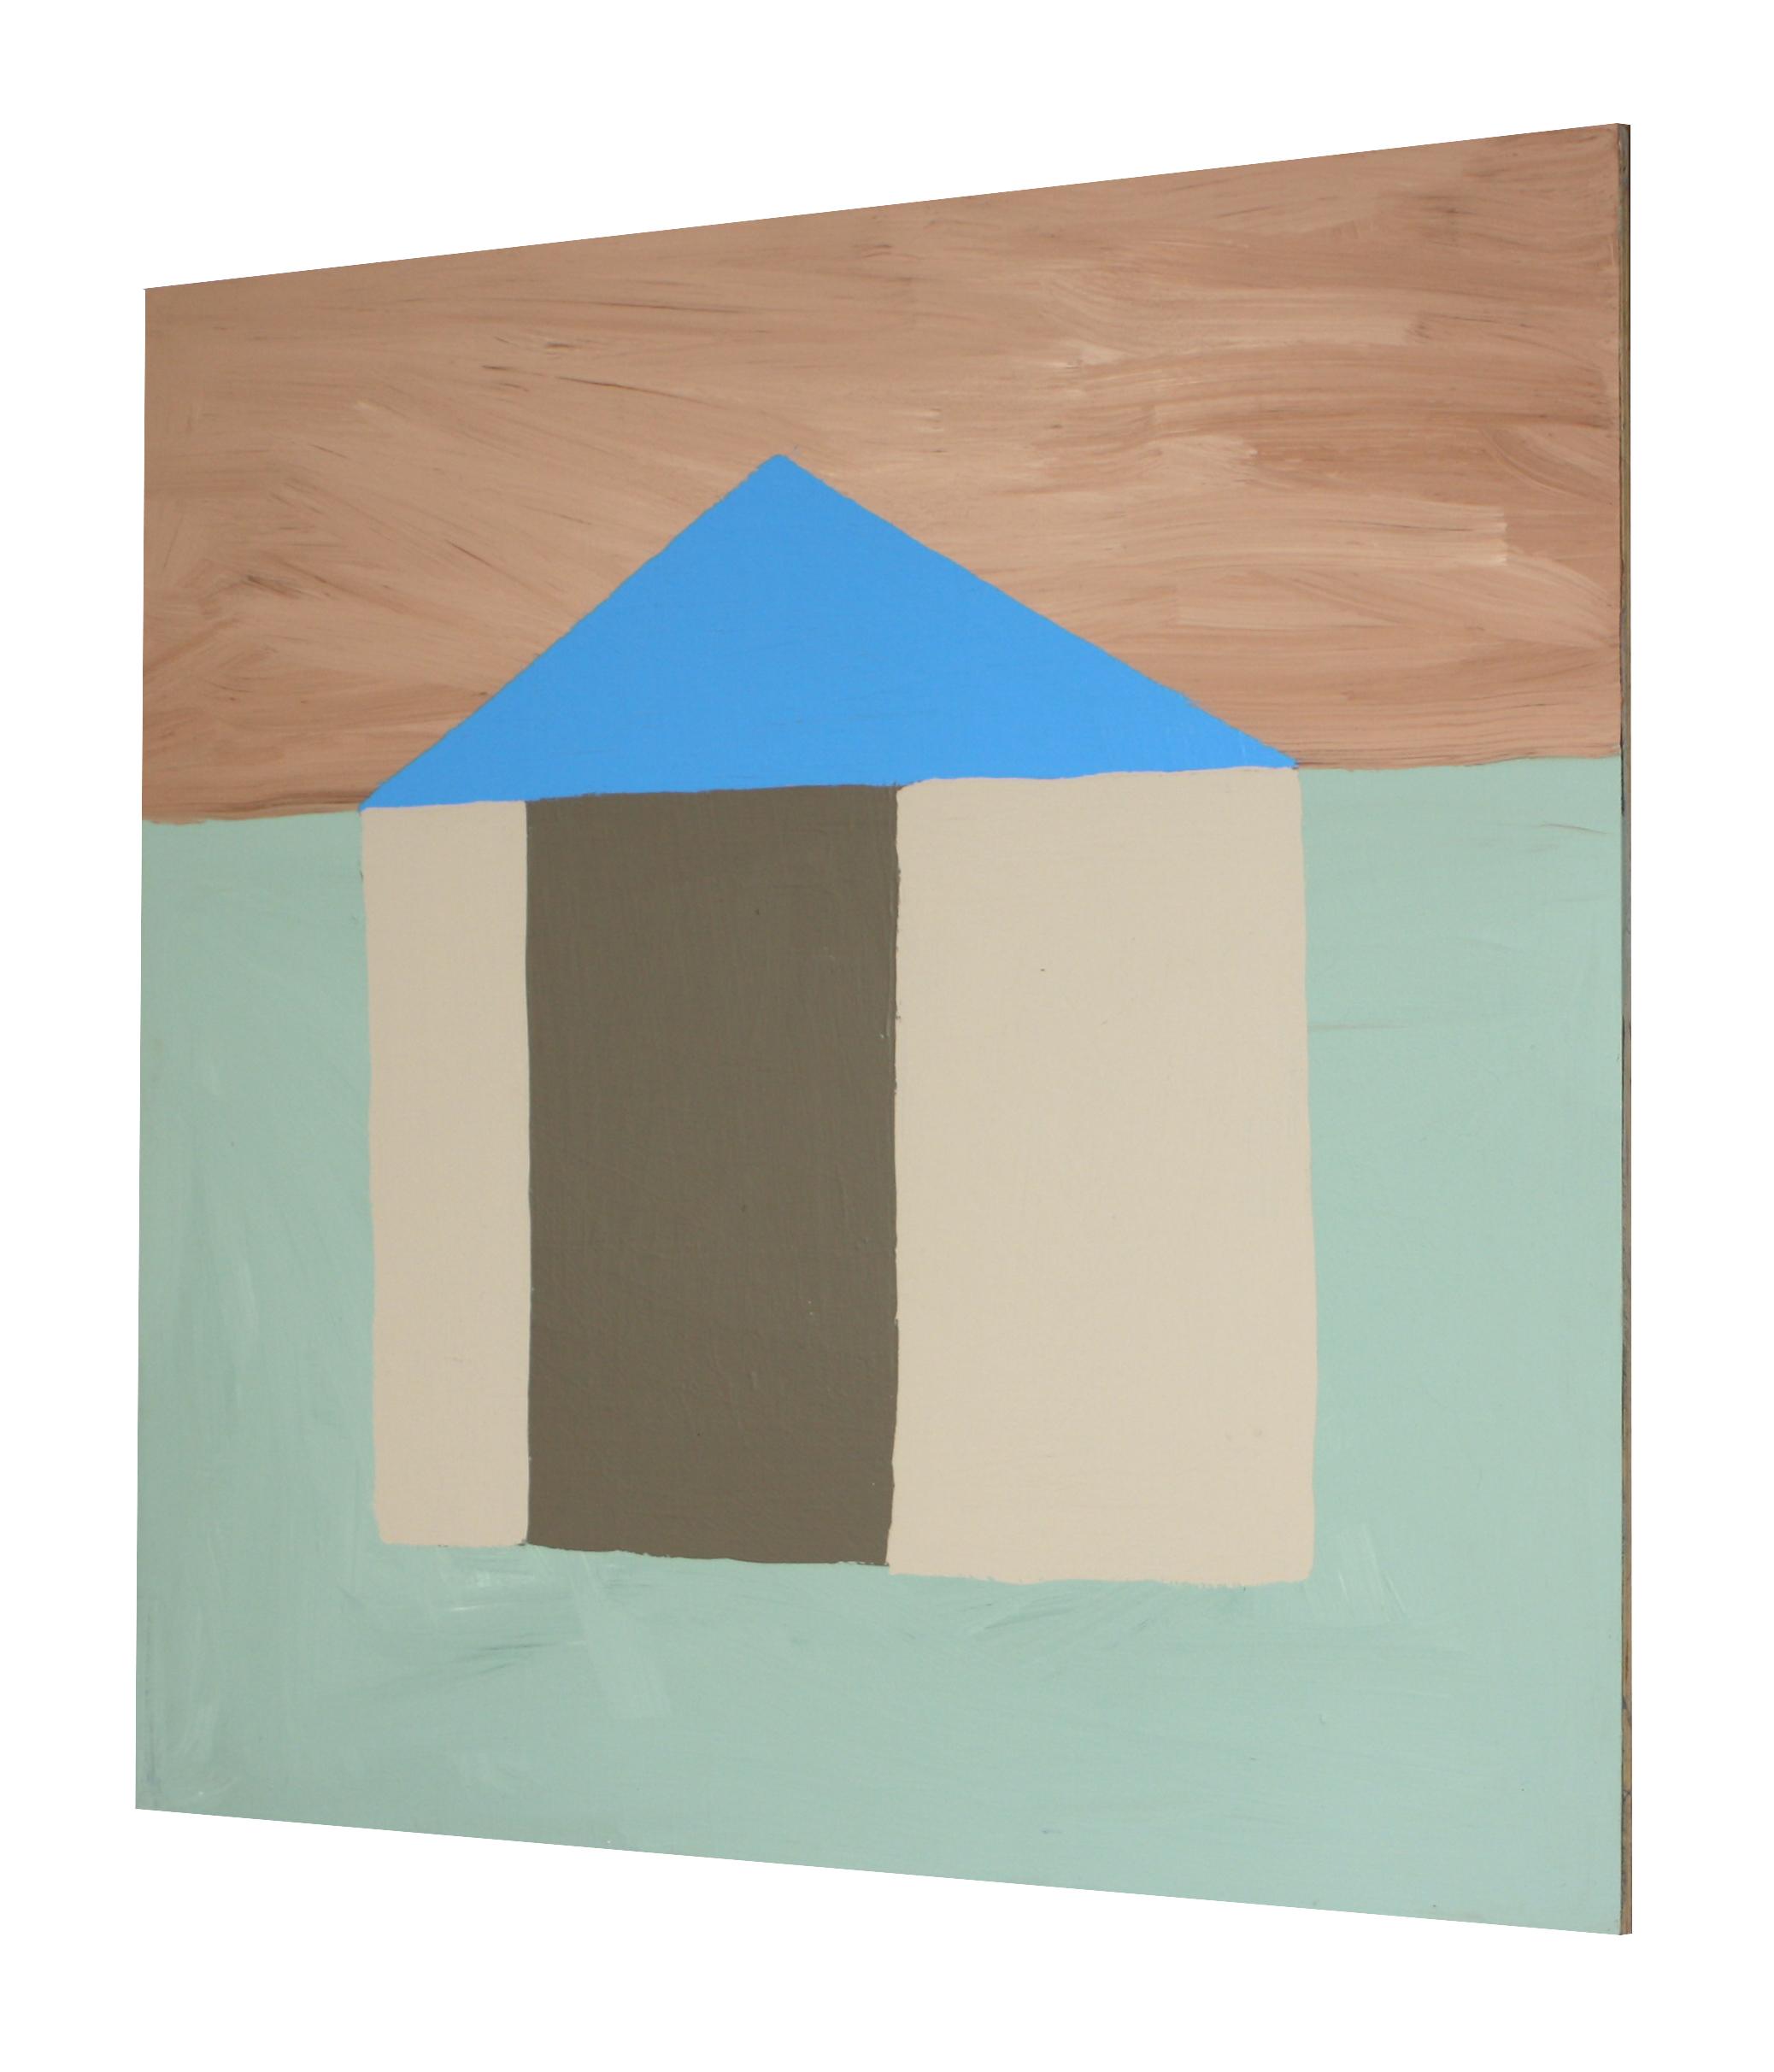 blueroof.jpg